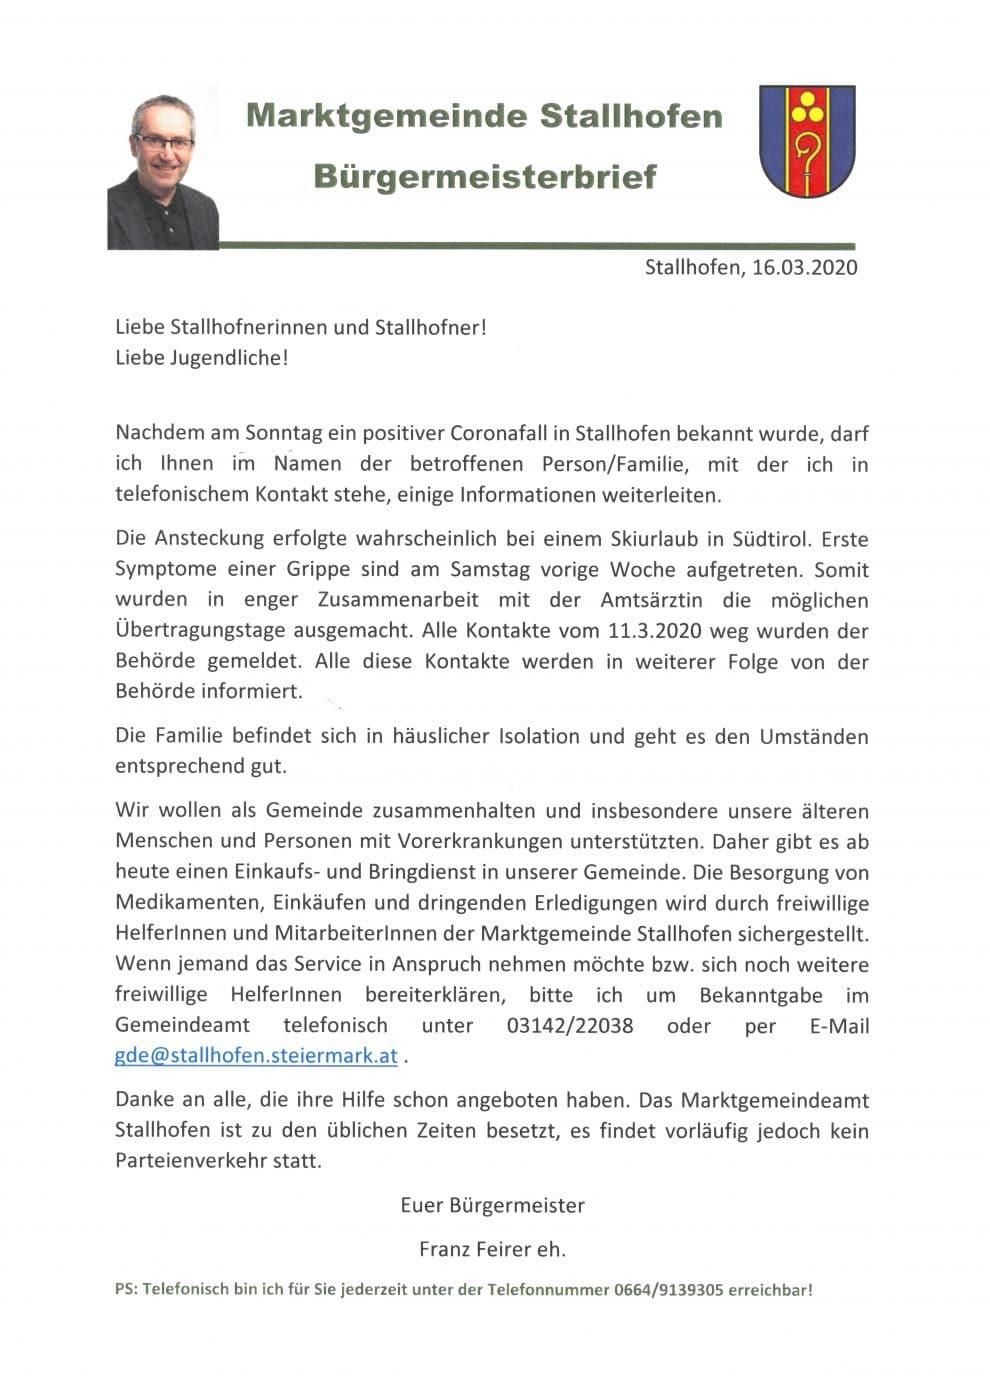 Bürgermeisterbrief betreffend Corona